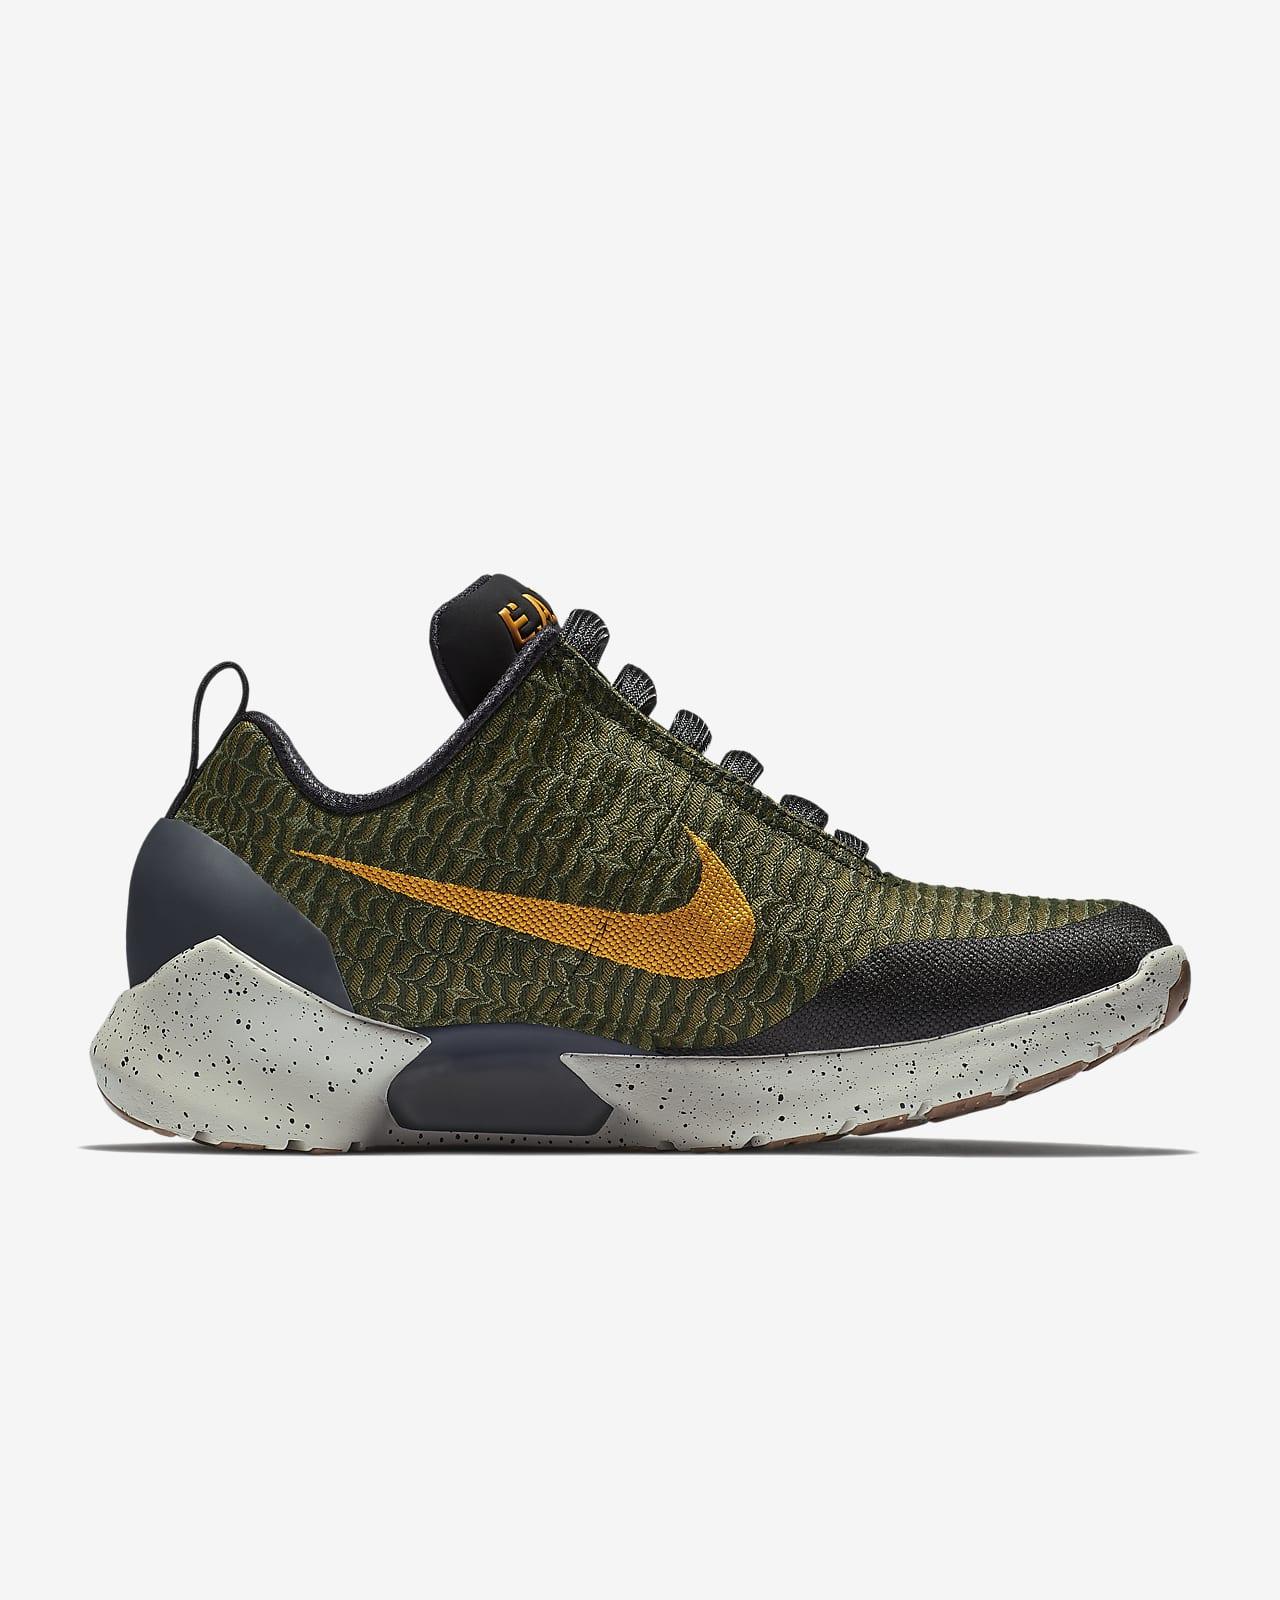 Chaussure Nike HyperAdapt 1.0 (EU Plug) pour Homme